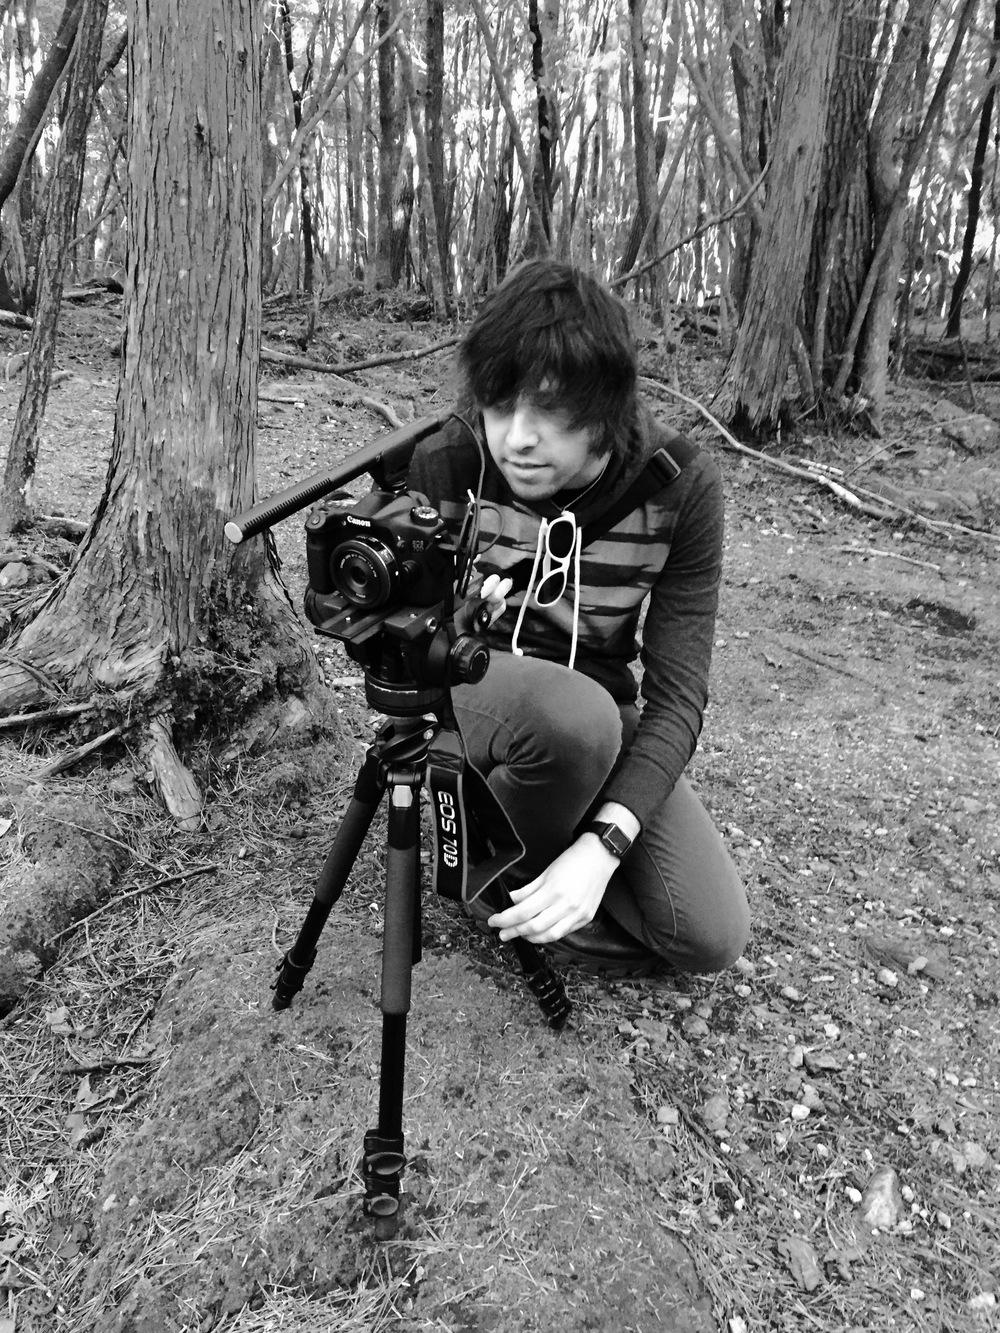 Jon Bero Filming